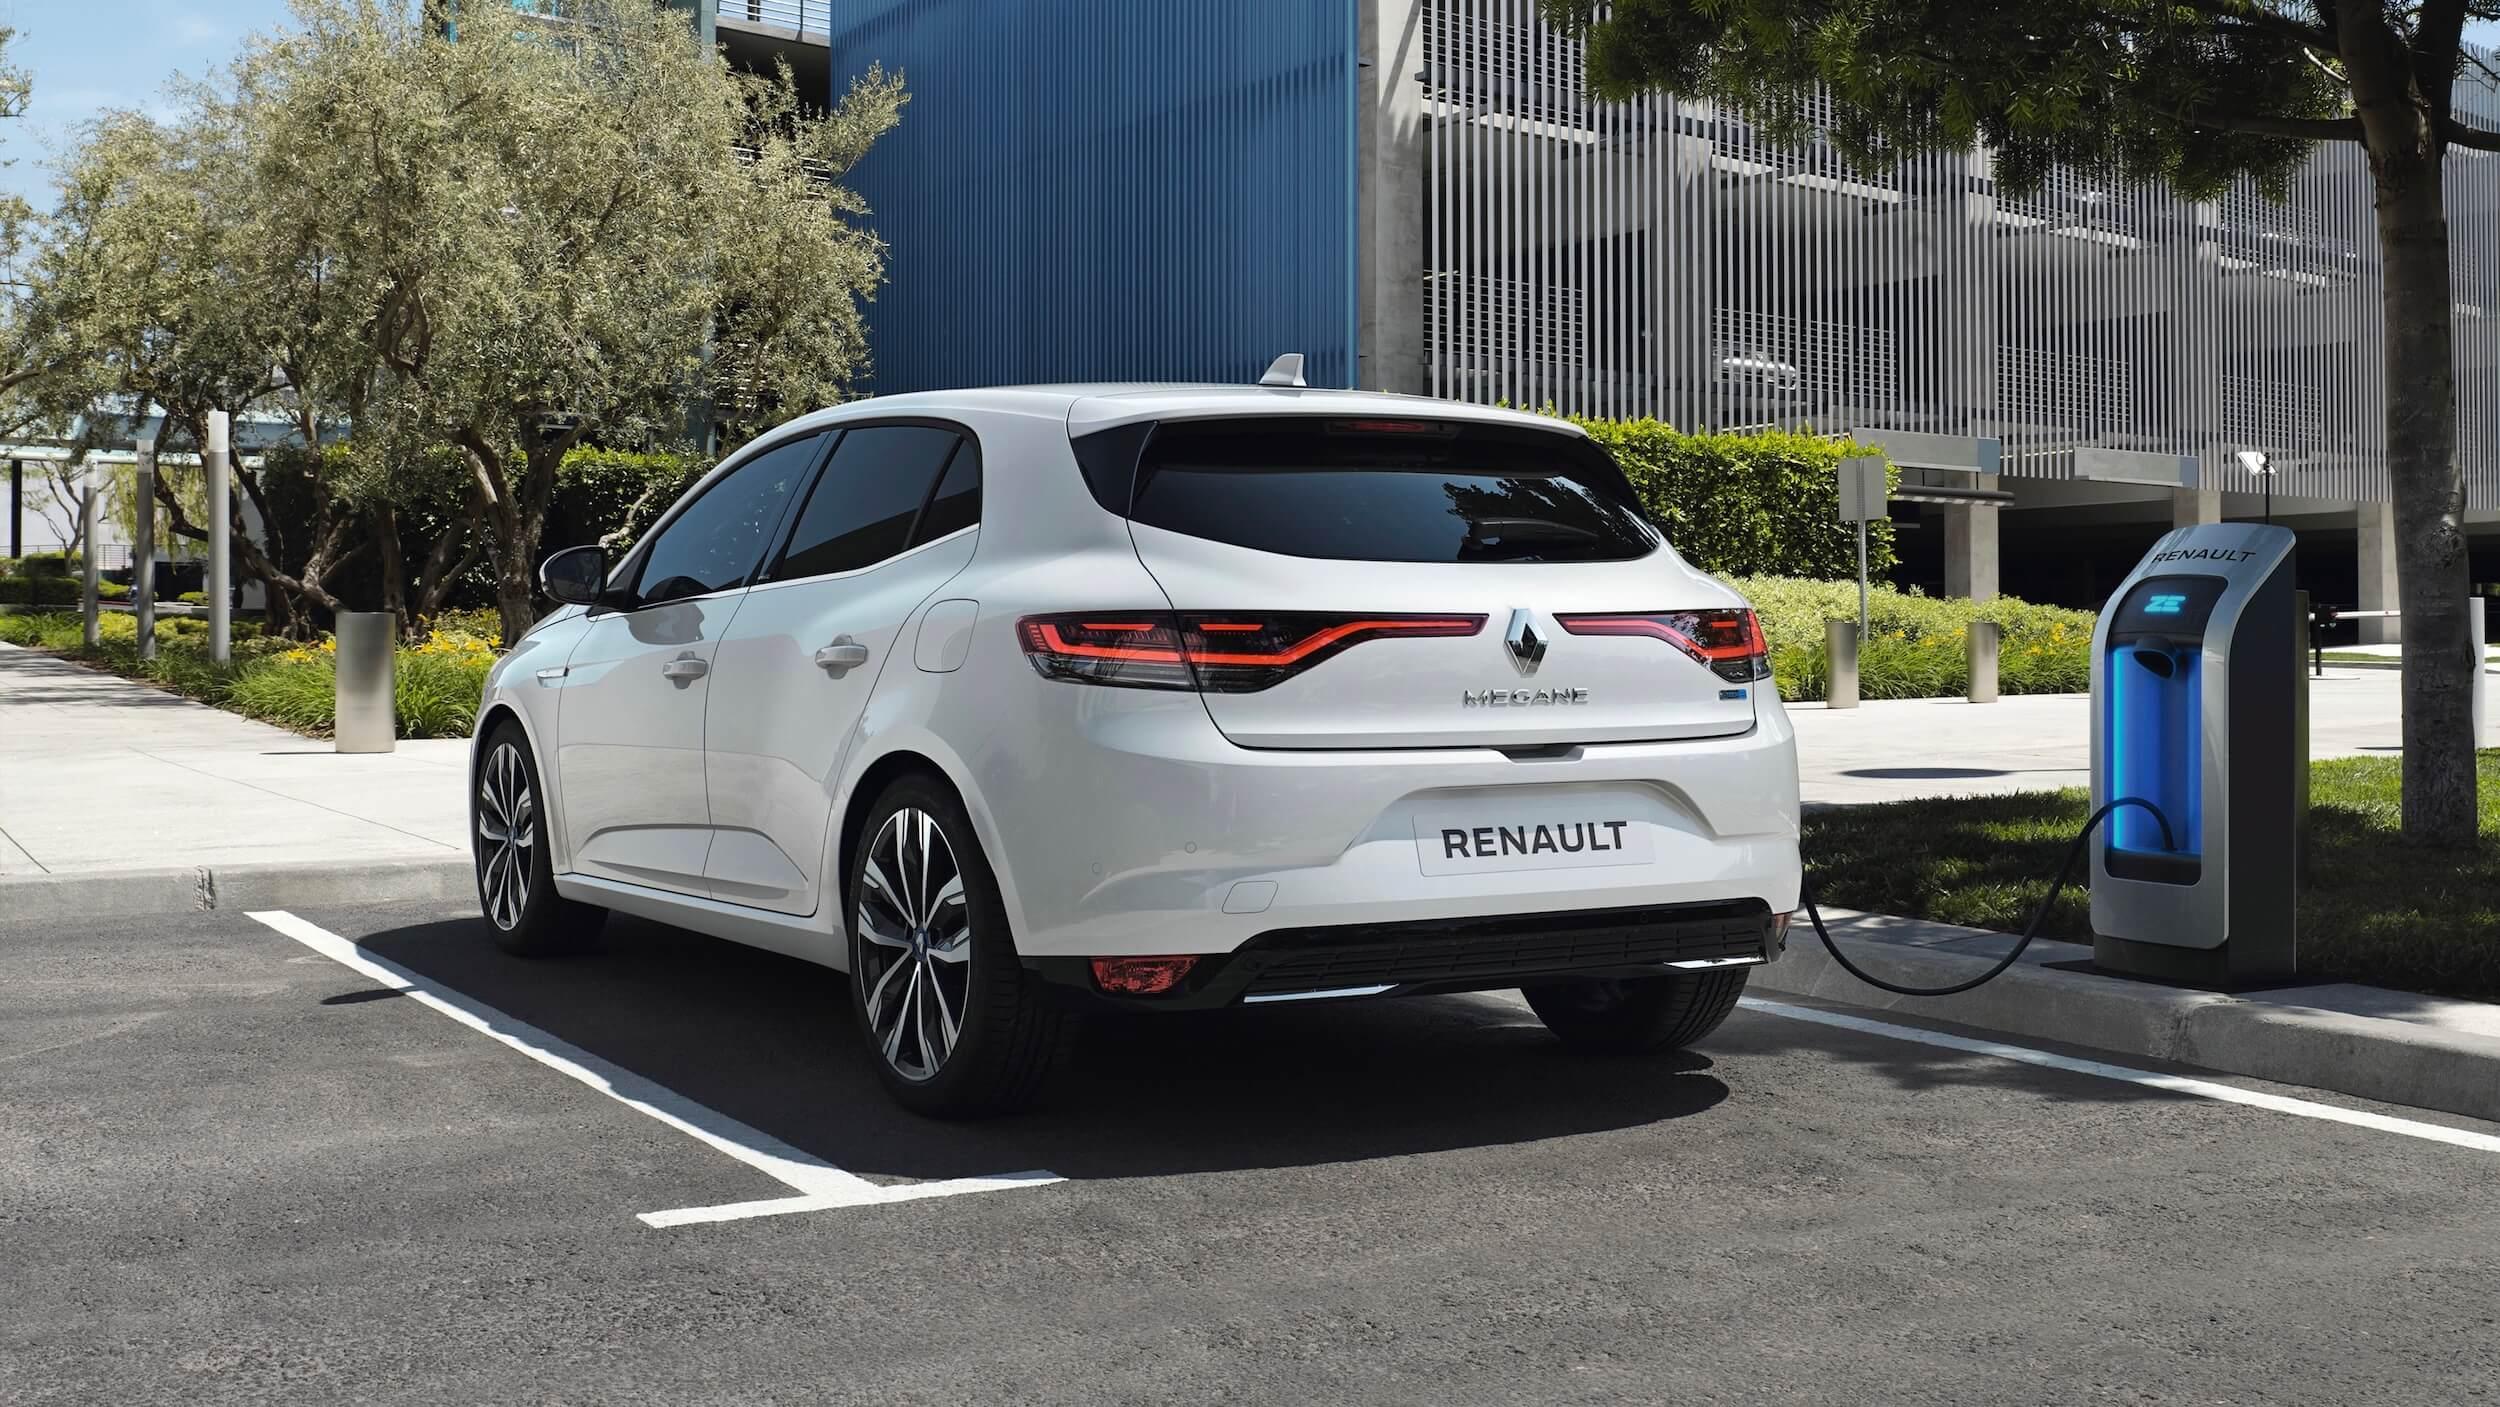 Renault Megane PHEV carregar